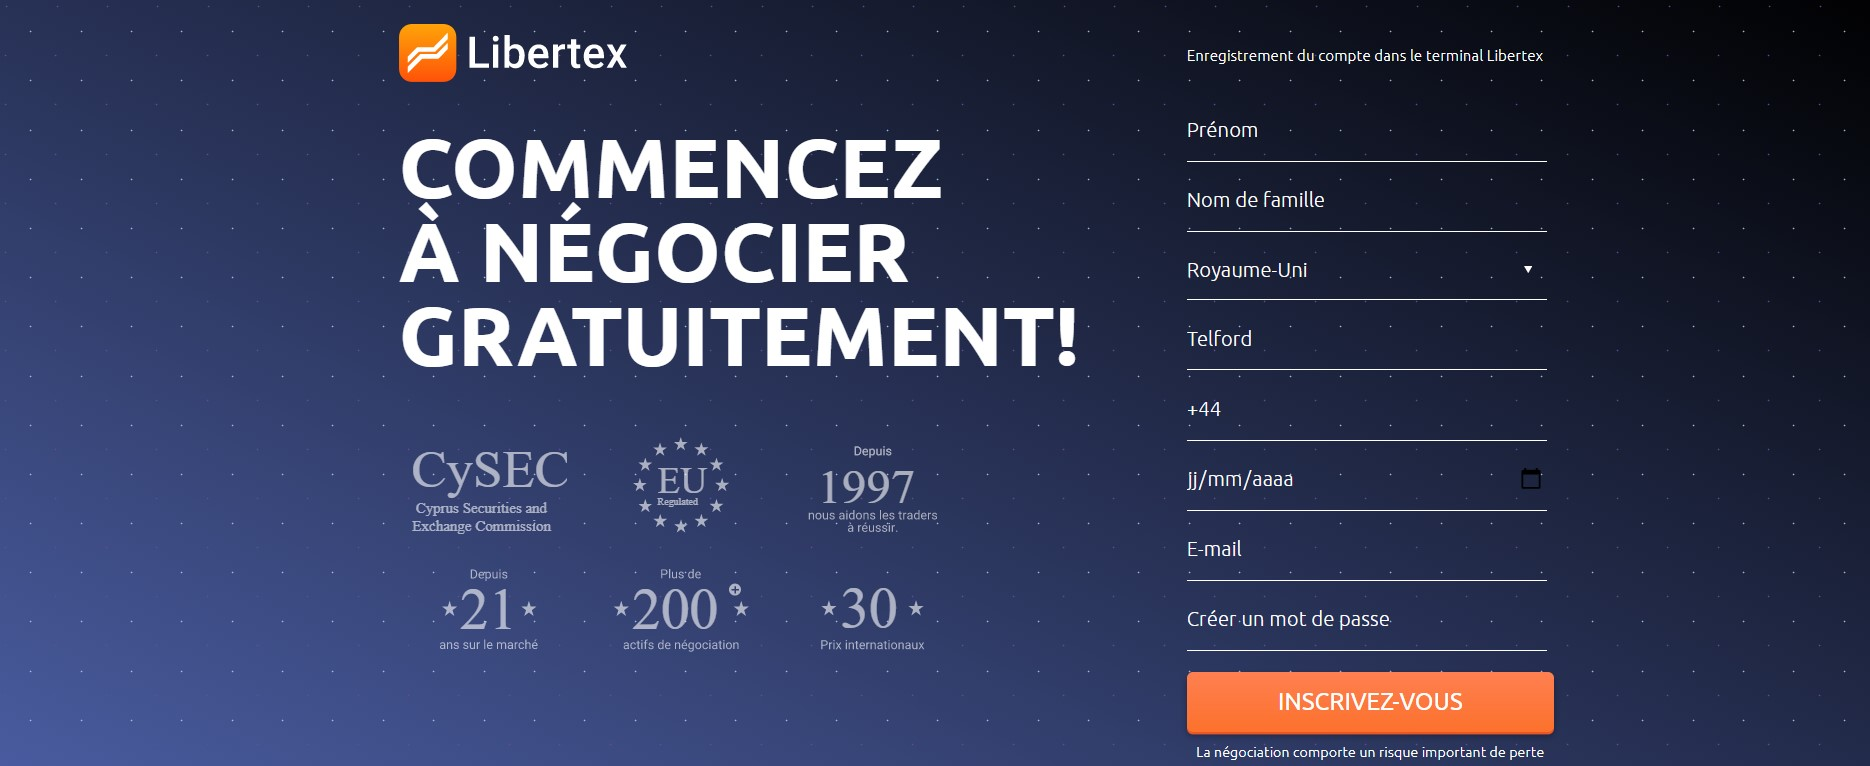 investir dans cours dash avec libertex